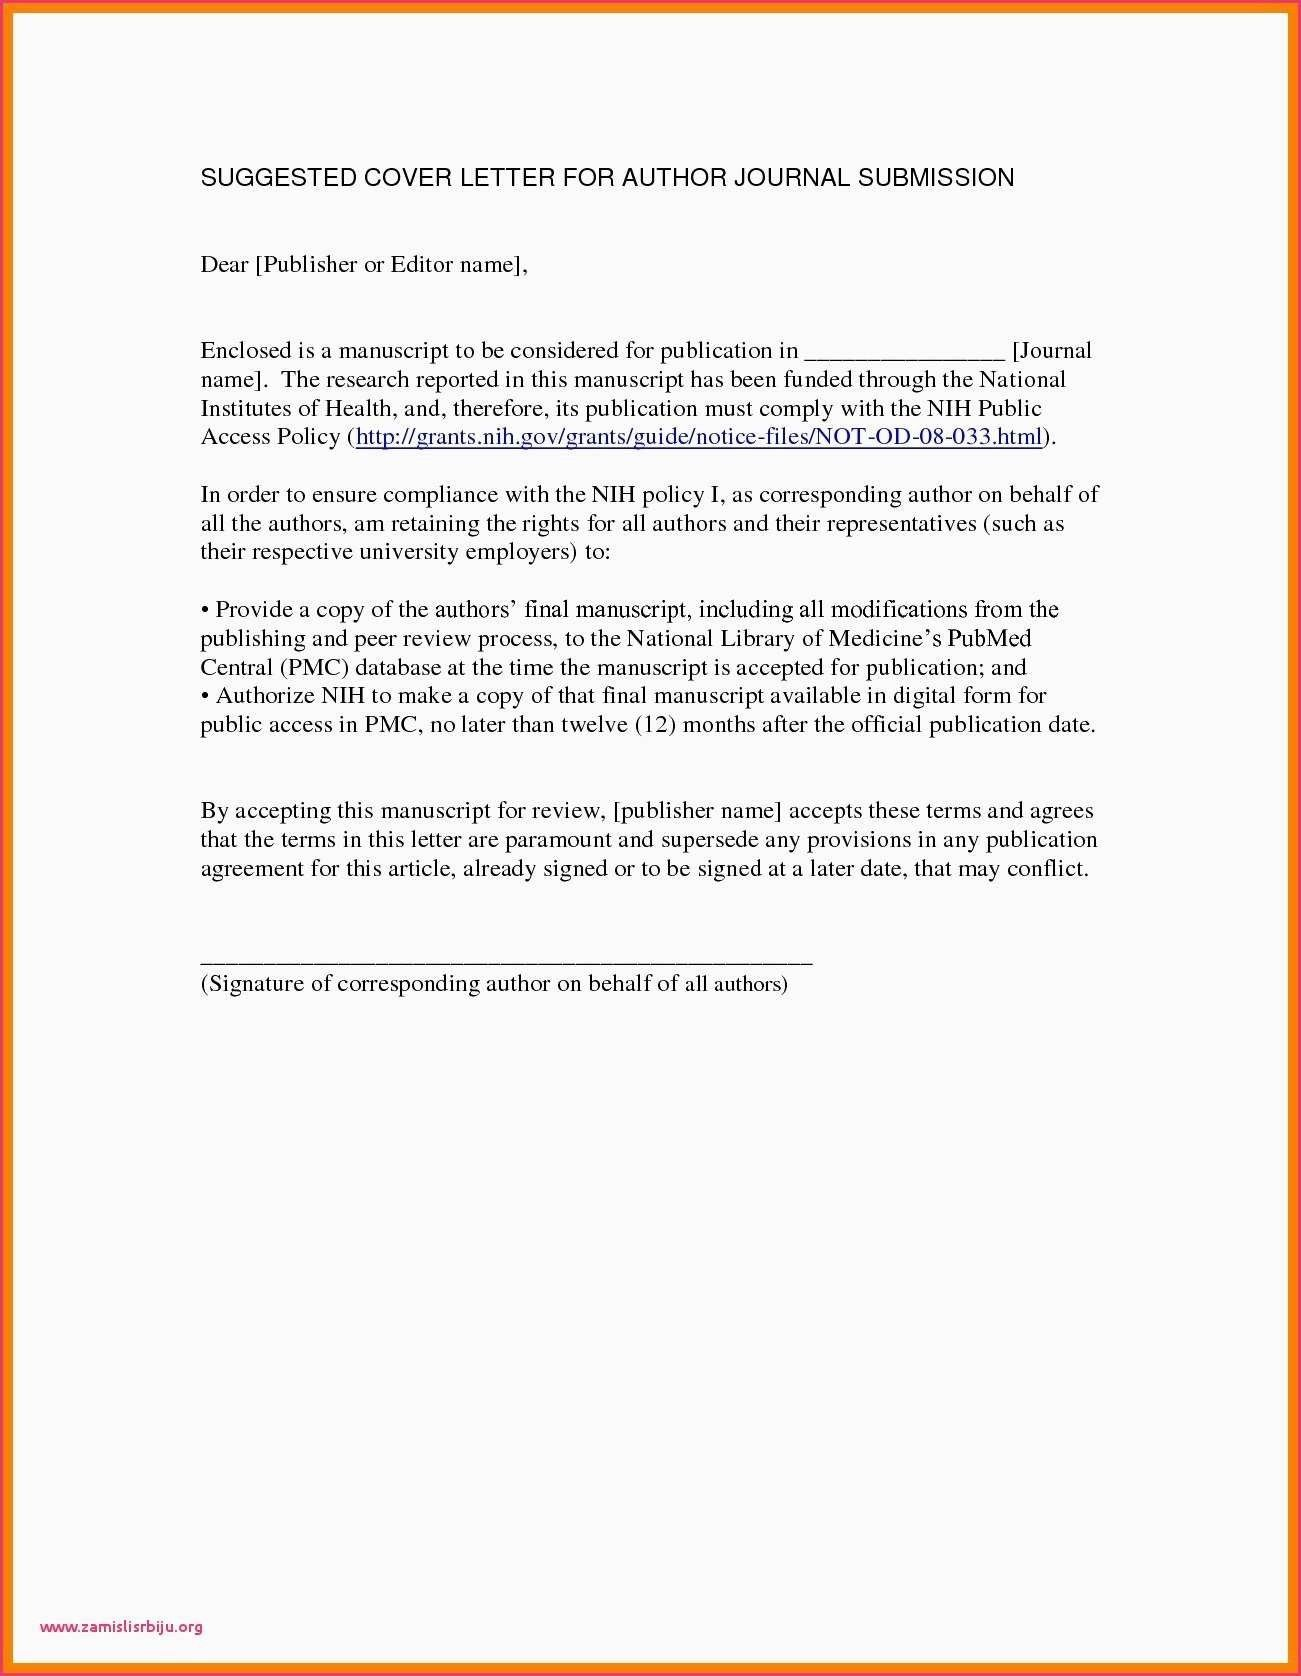 Download New Sample Letter Of Refusal Of Job Offer At Https Www